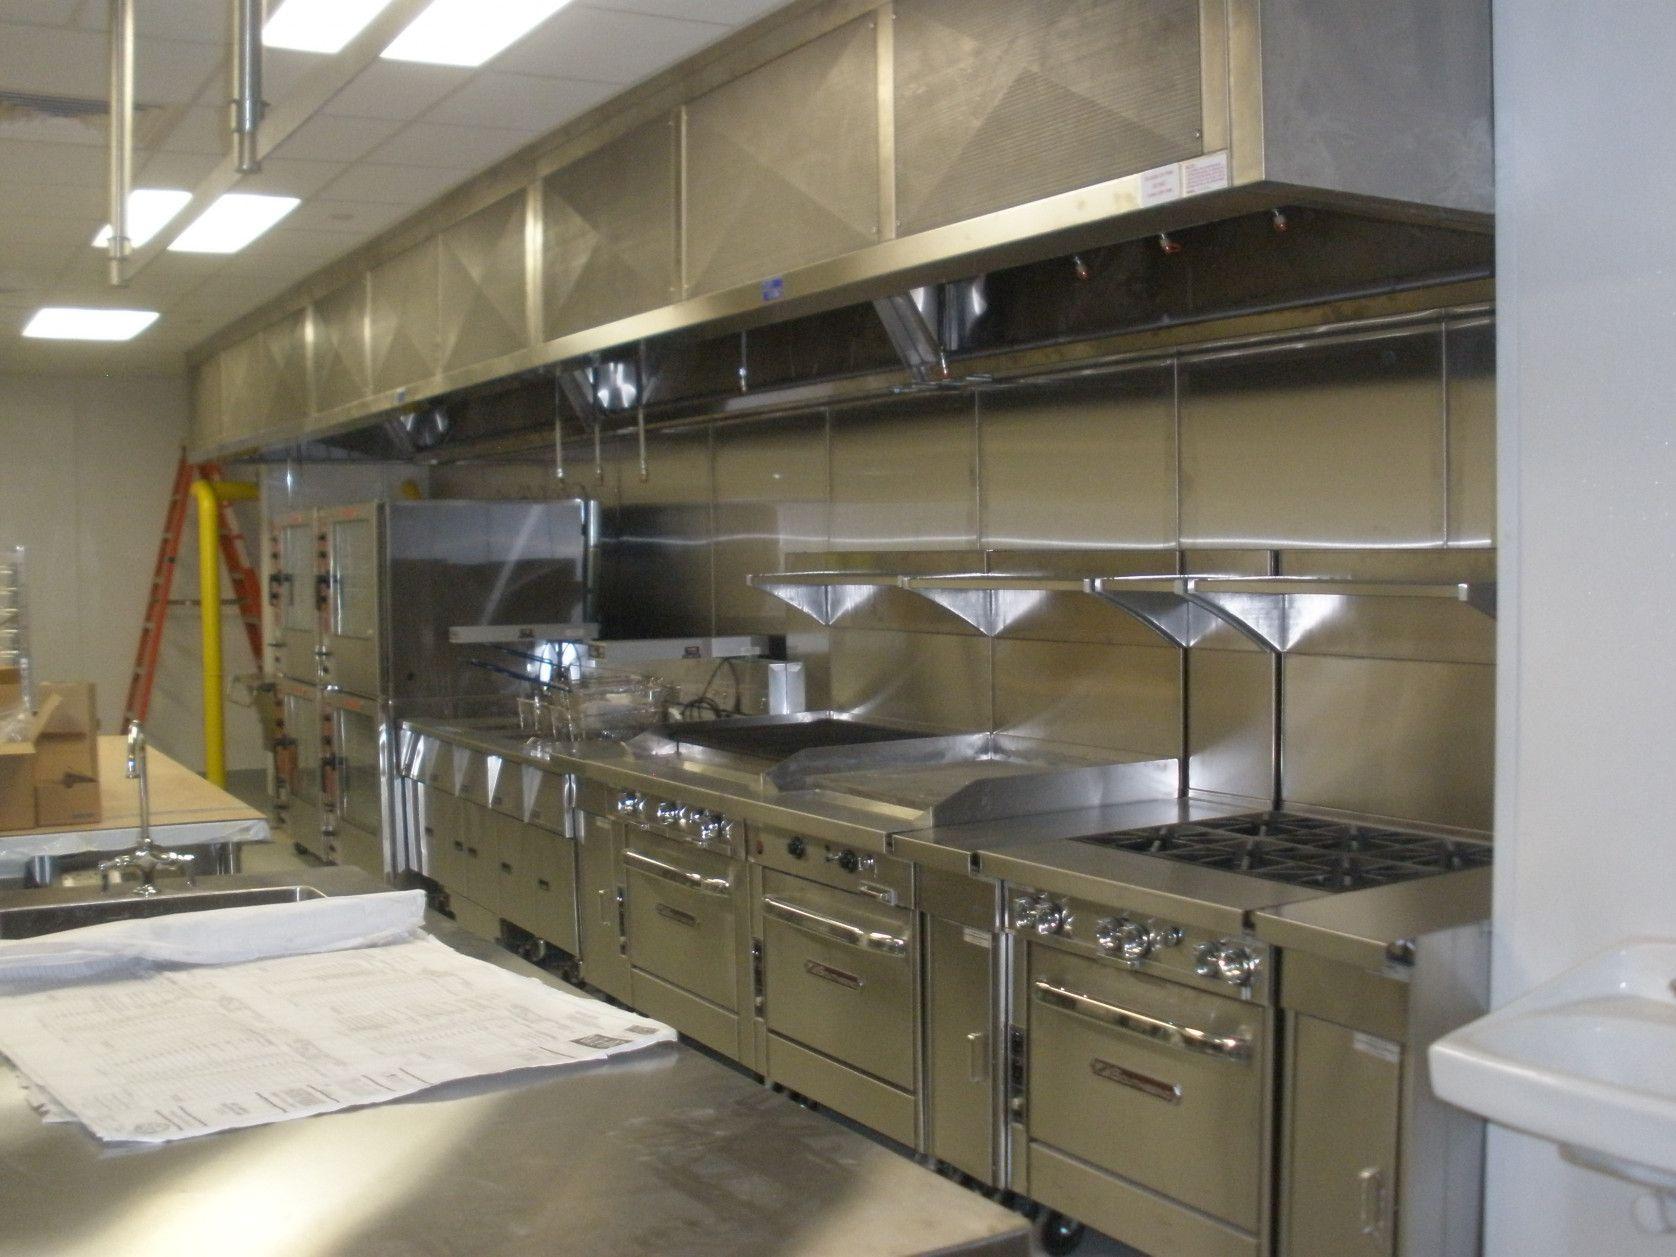 Commercial kitchen design   Kitchen Incubator   Pinterest ...